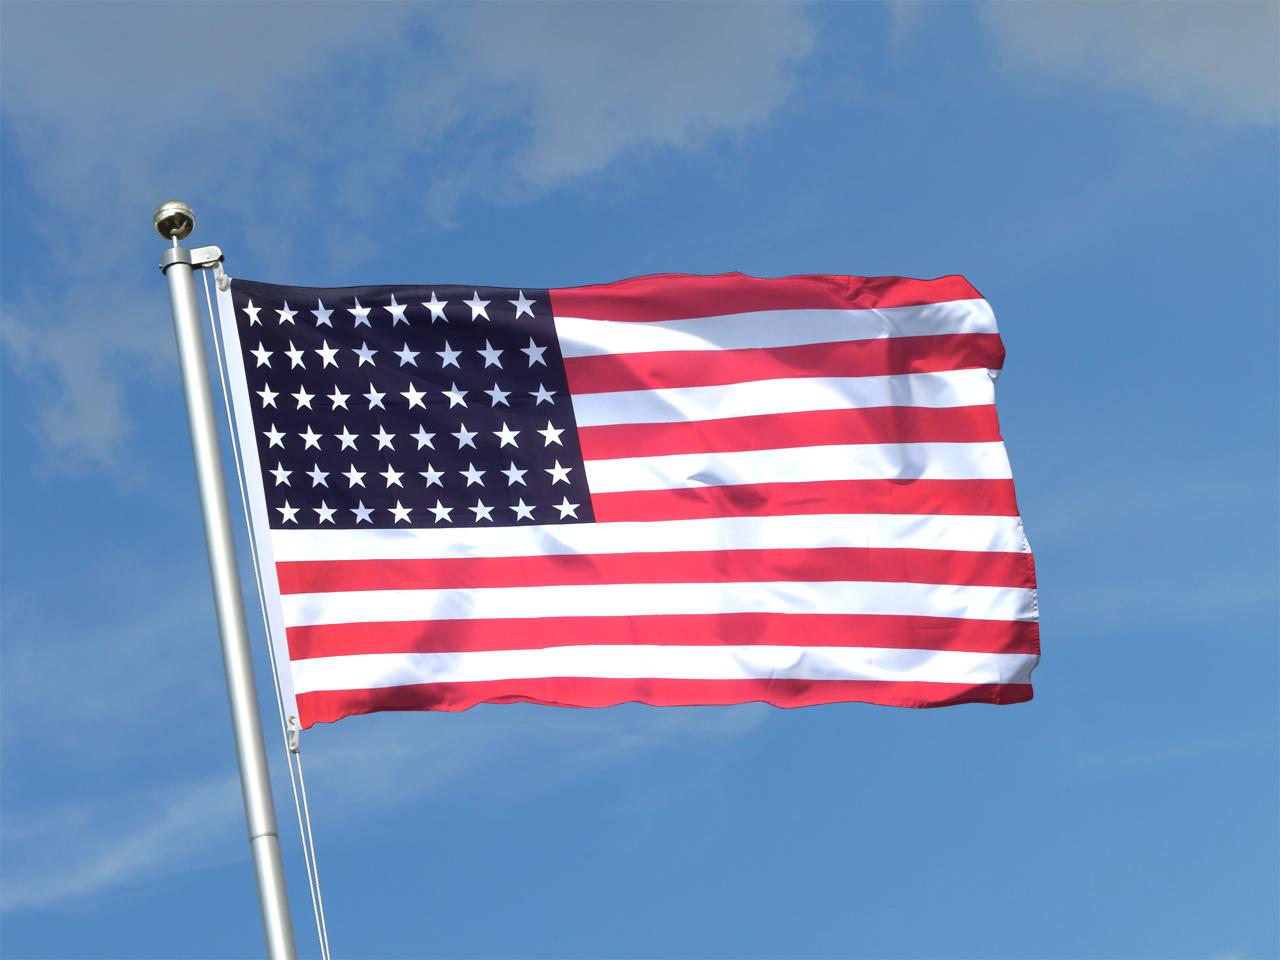 Buy USA 48 stars Flag - 3x5 ft (90x150 cm) - Royal-Flags